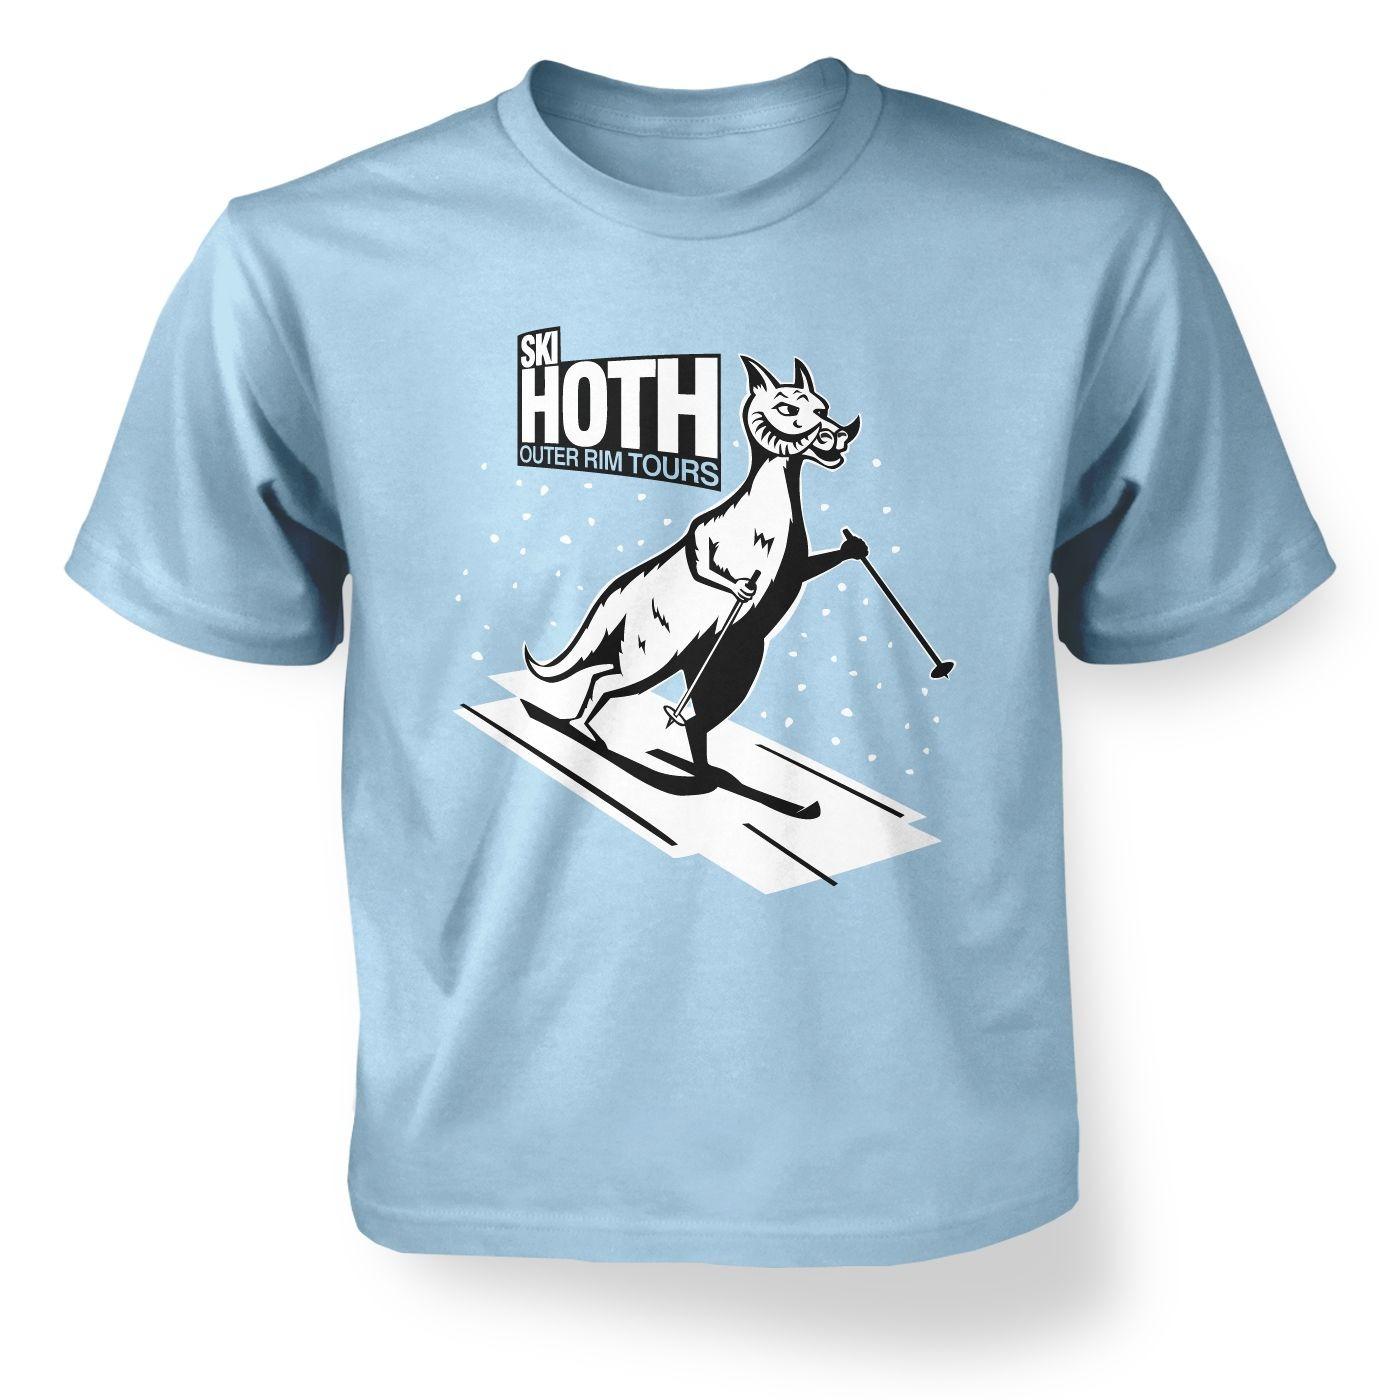 Kids' Ski Hoth t-shirt - Inspired by Star Wars